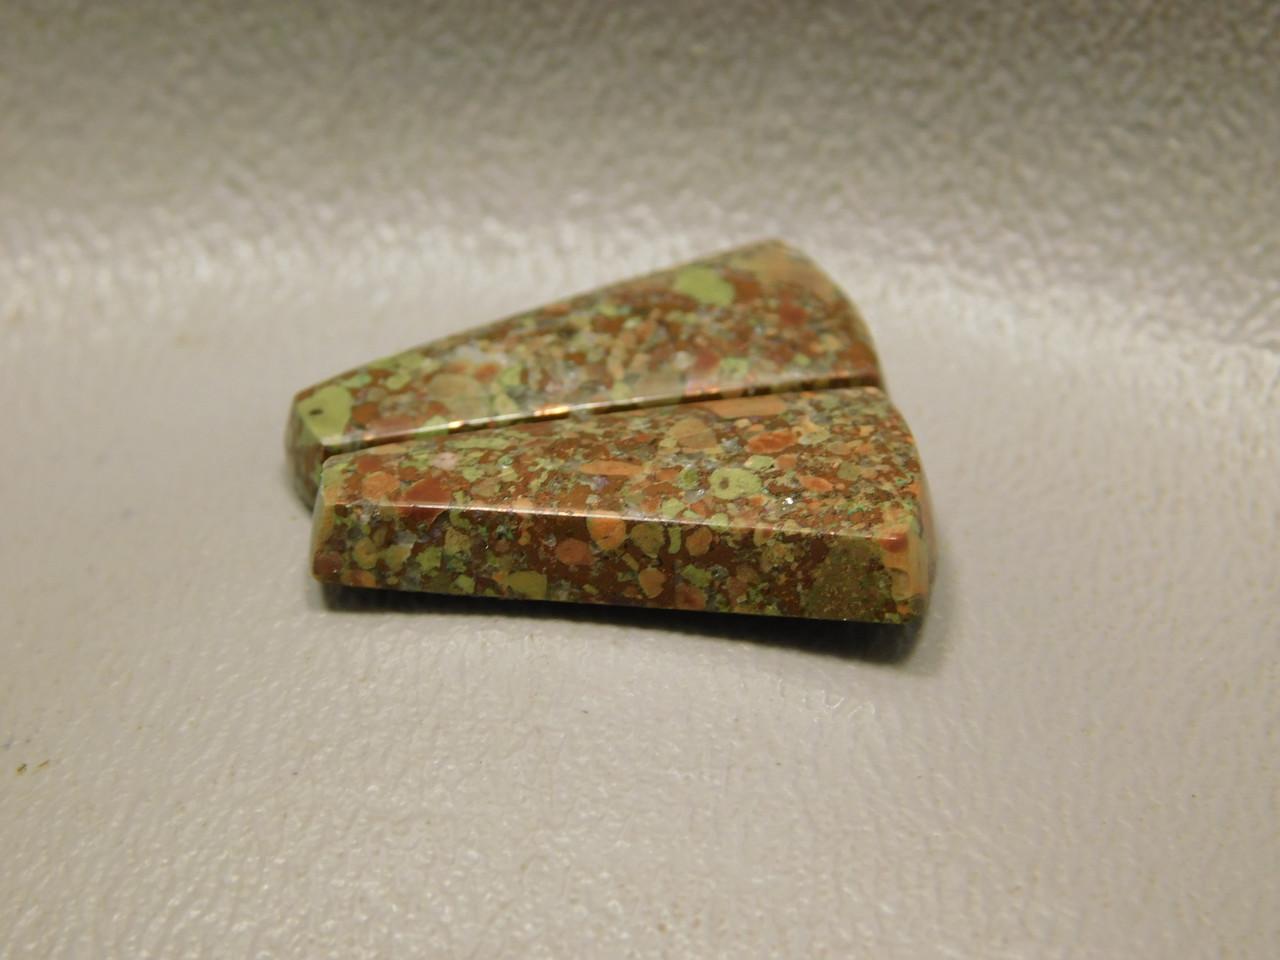 Copper Rose Semi Precious Gemstone Matched Pair Cabochons #19